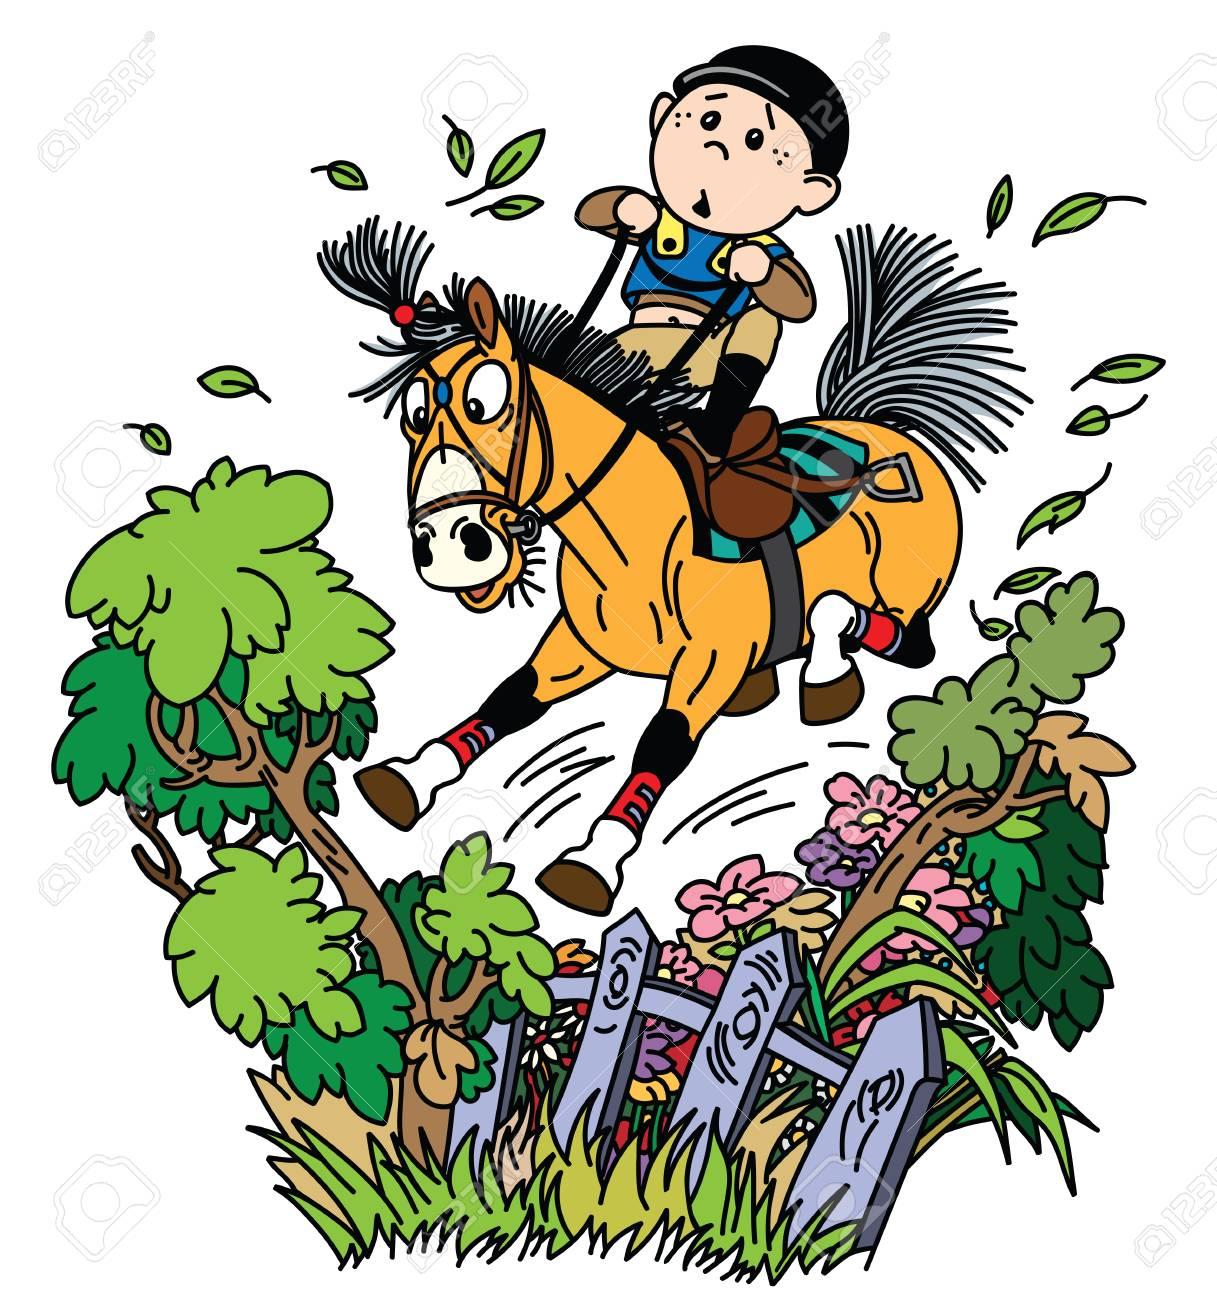 Cartoon Boy Jockey Riding His Pony Horse And Training To Jump Royalty Free Cliparts Vectors And Stock Illustration Image 116481037